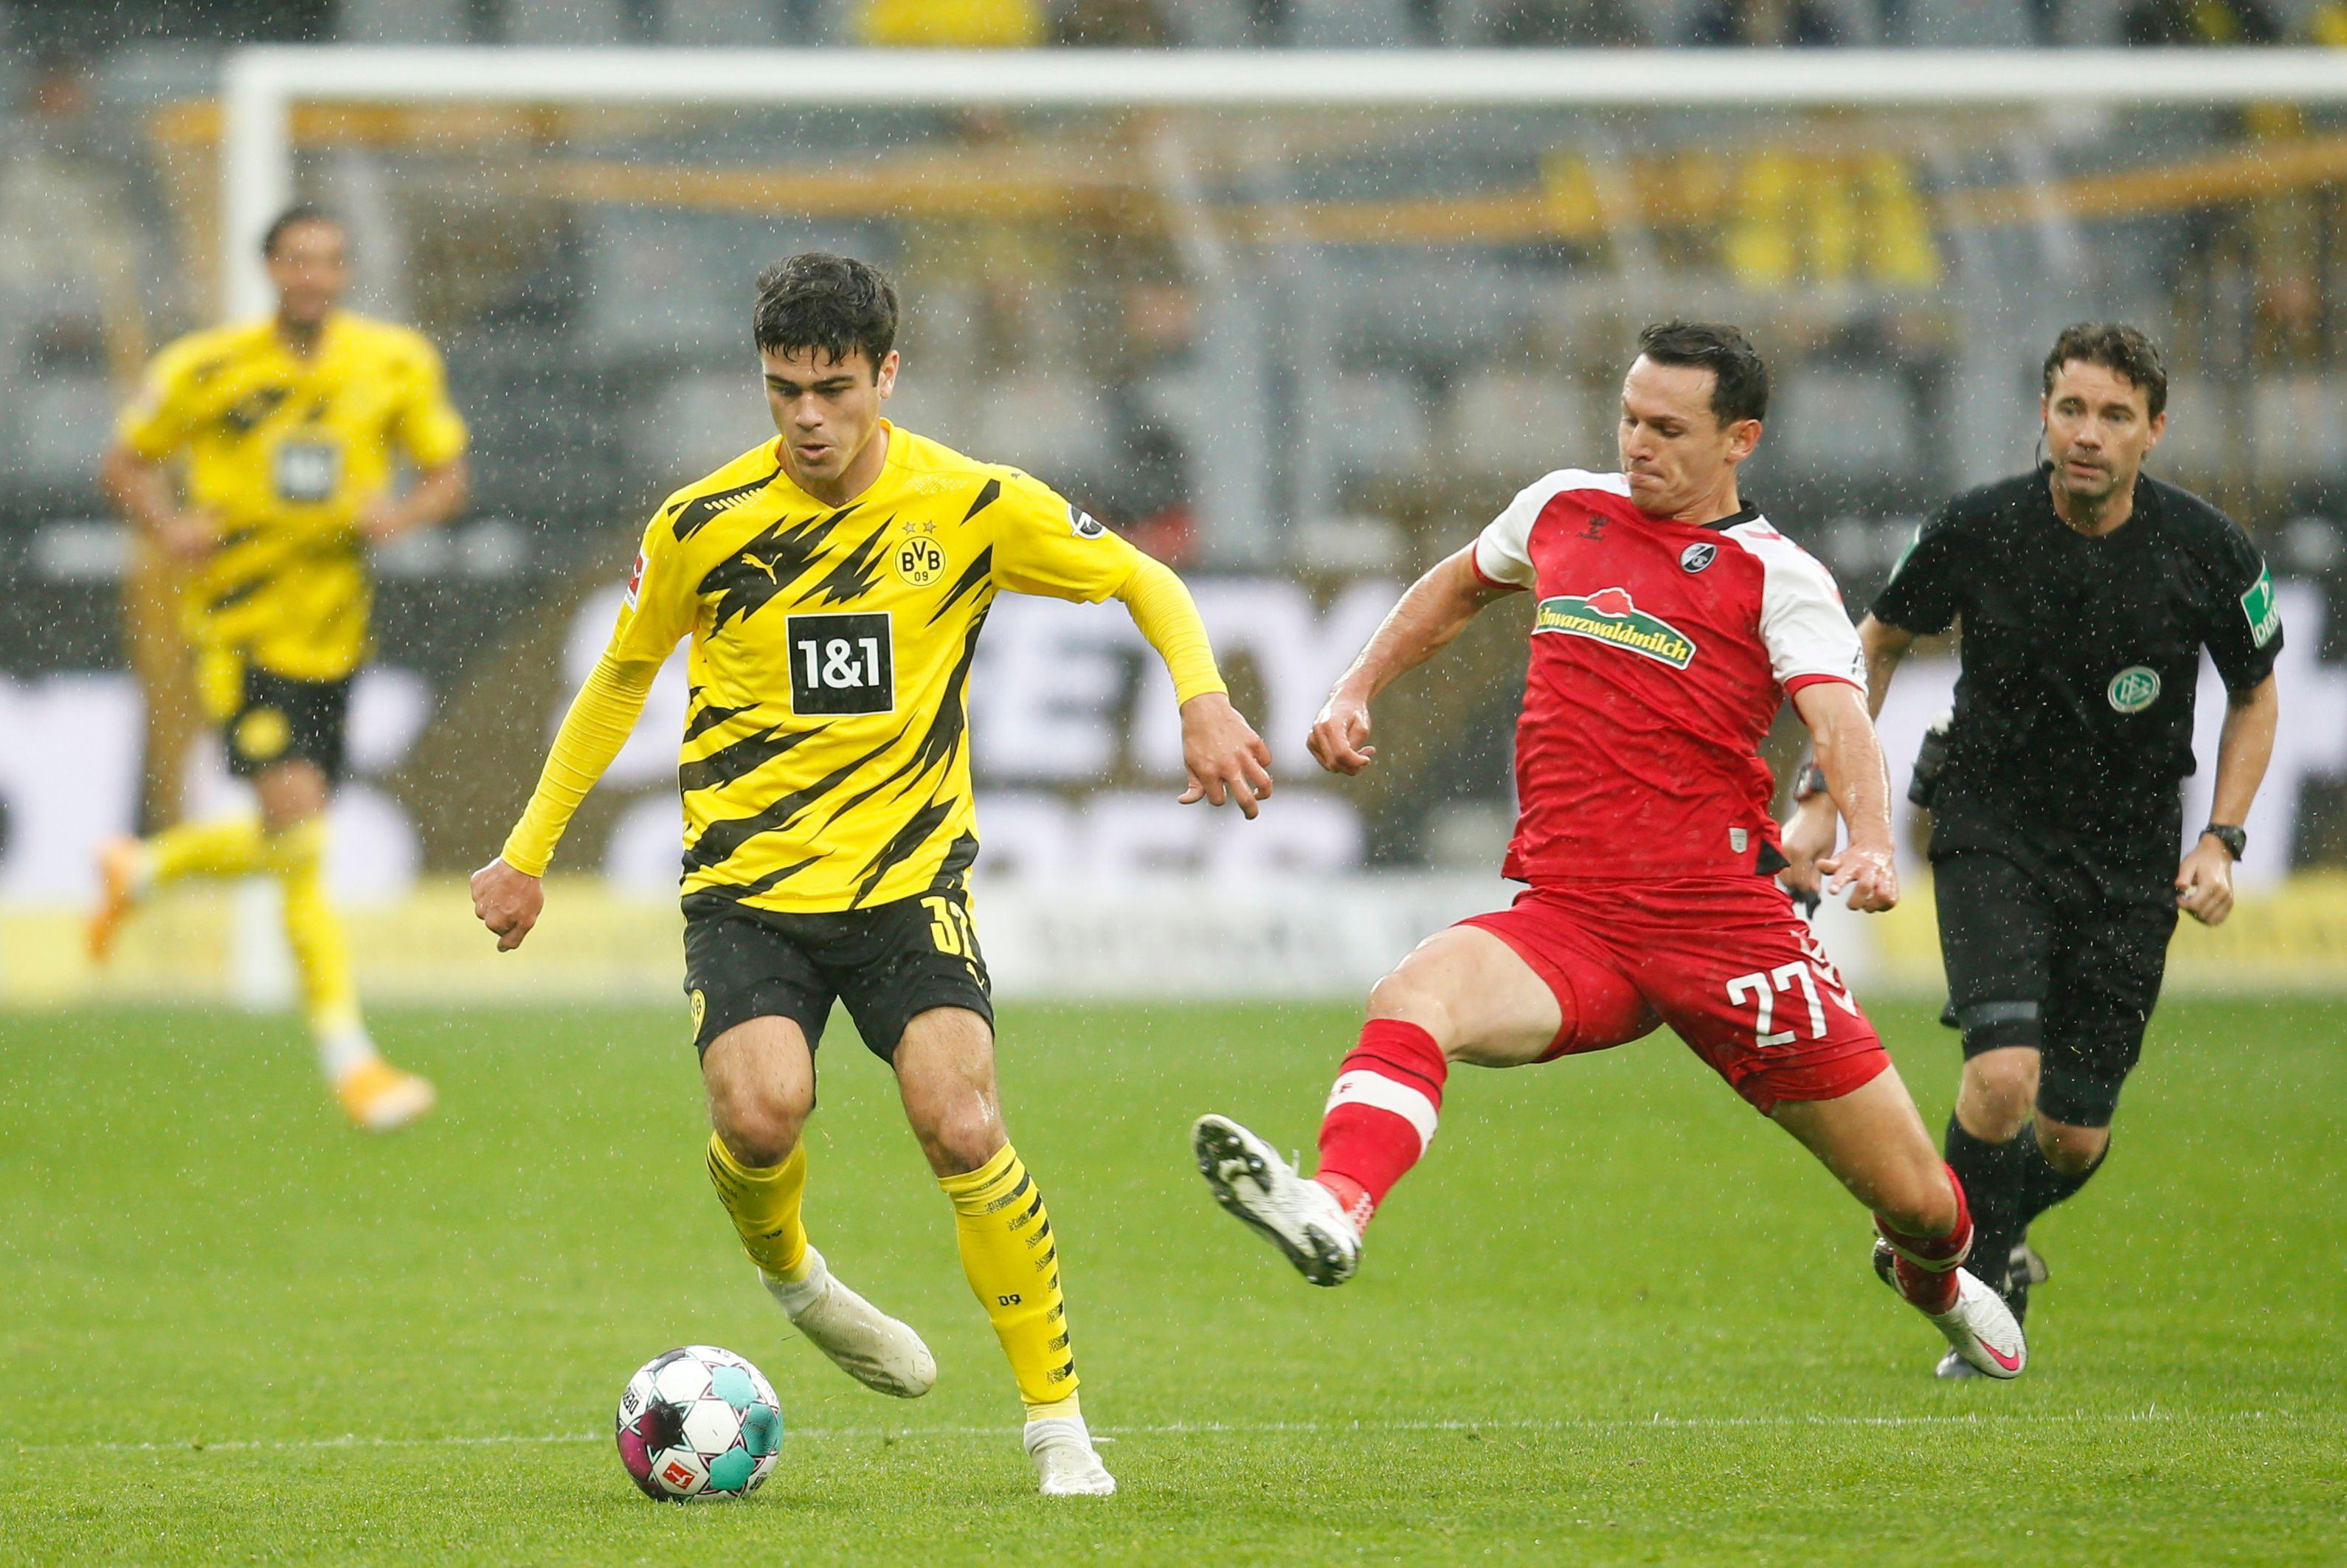 Giovanni Reyna, futbolista del Borussia Dortmund (REUTERS/Leon Kuegeler)